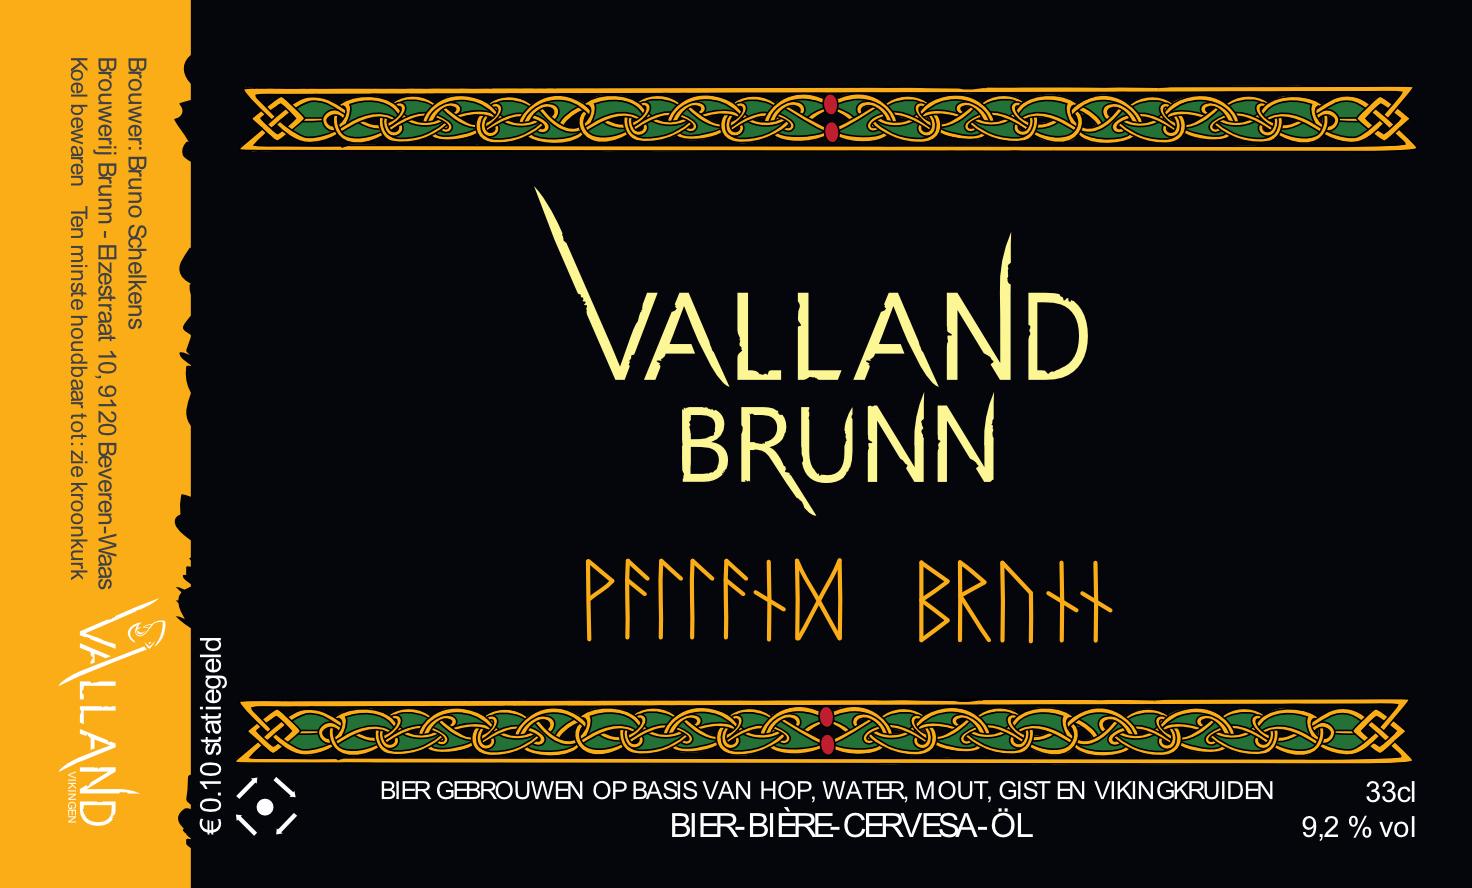 Valland Brunn